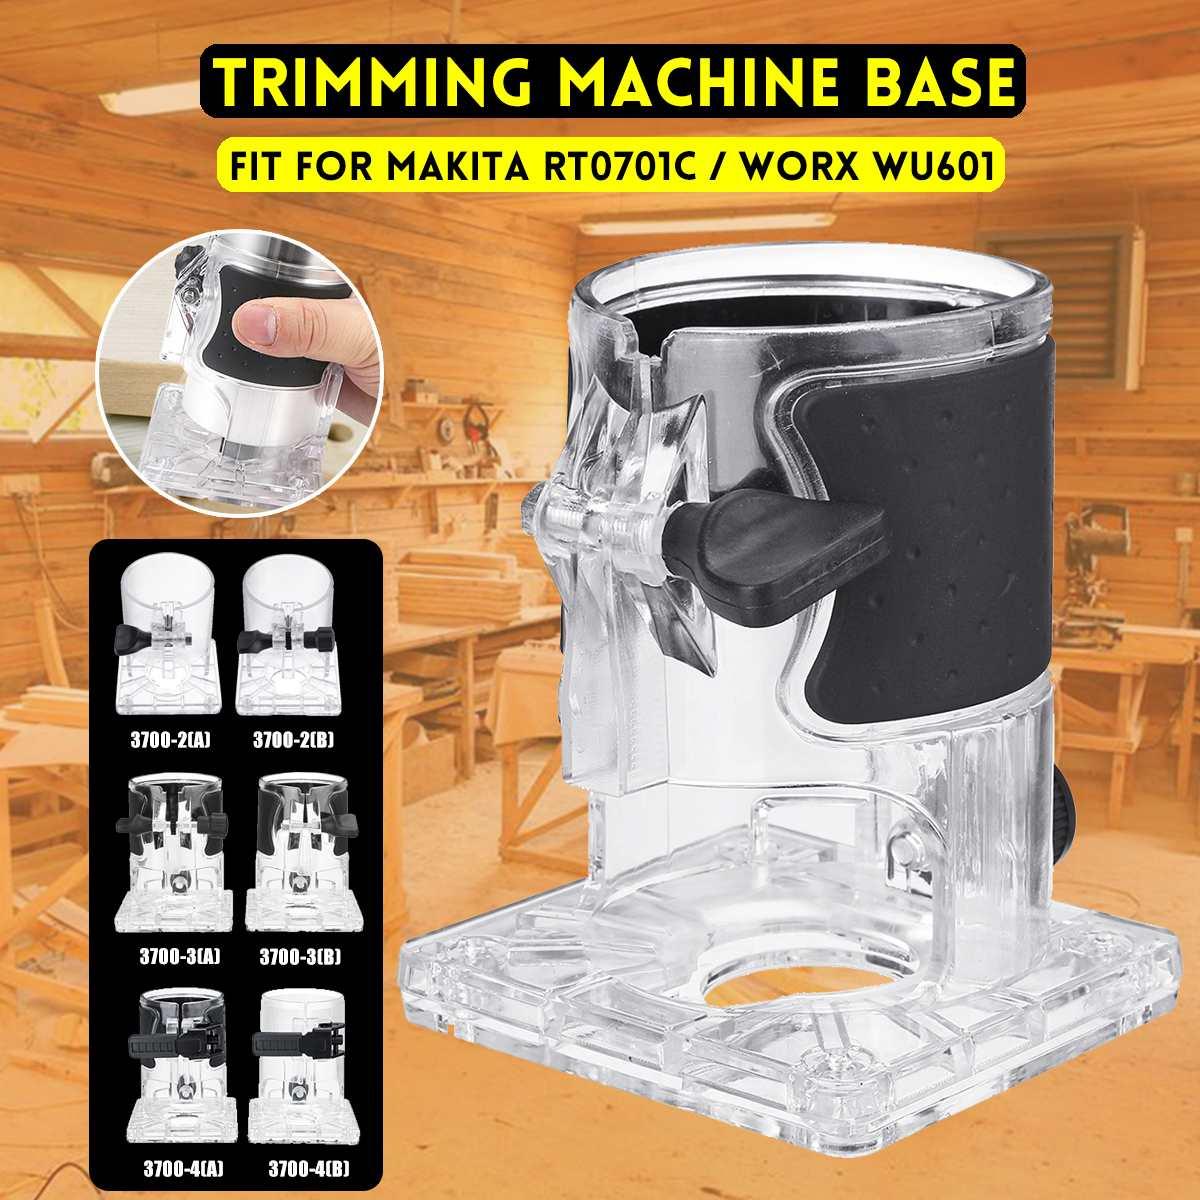 Trimmer Base Balance Board Woodworking Edge Cutter Electric Trimmer Machine Base For Makita RT0701C/Worx WU601